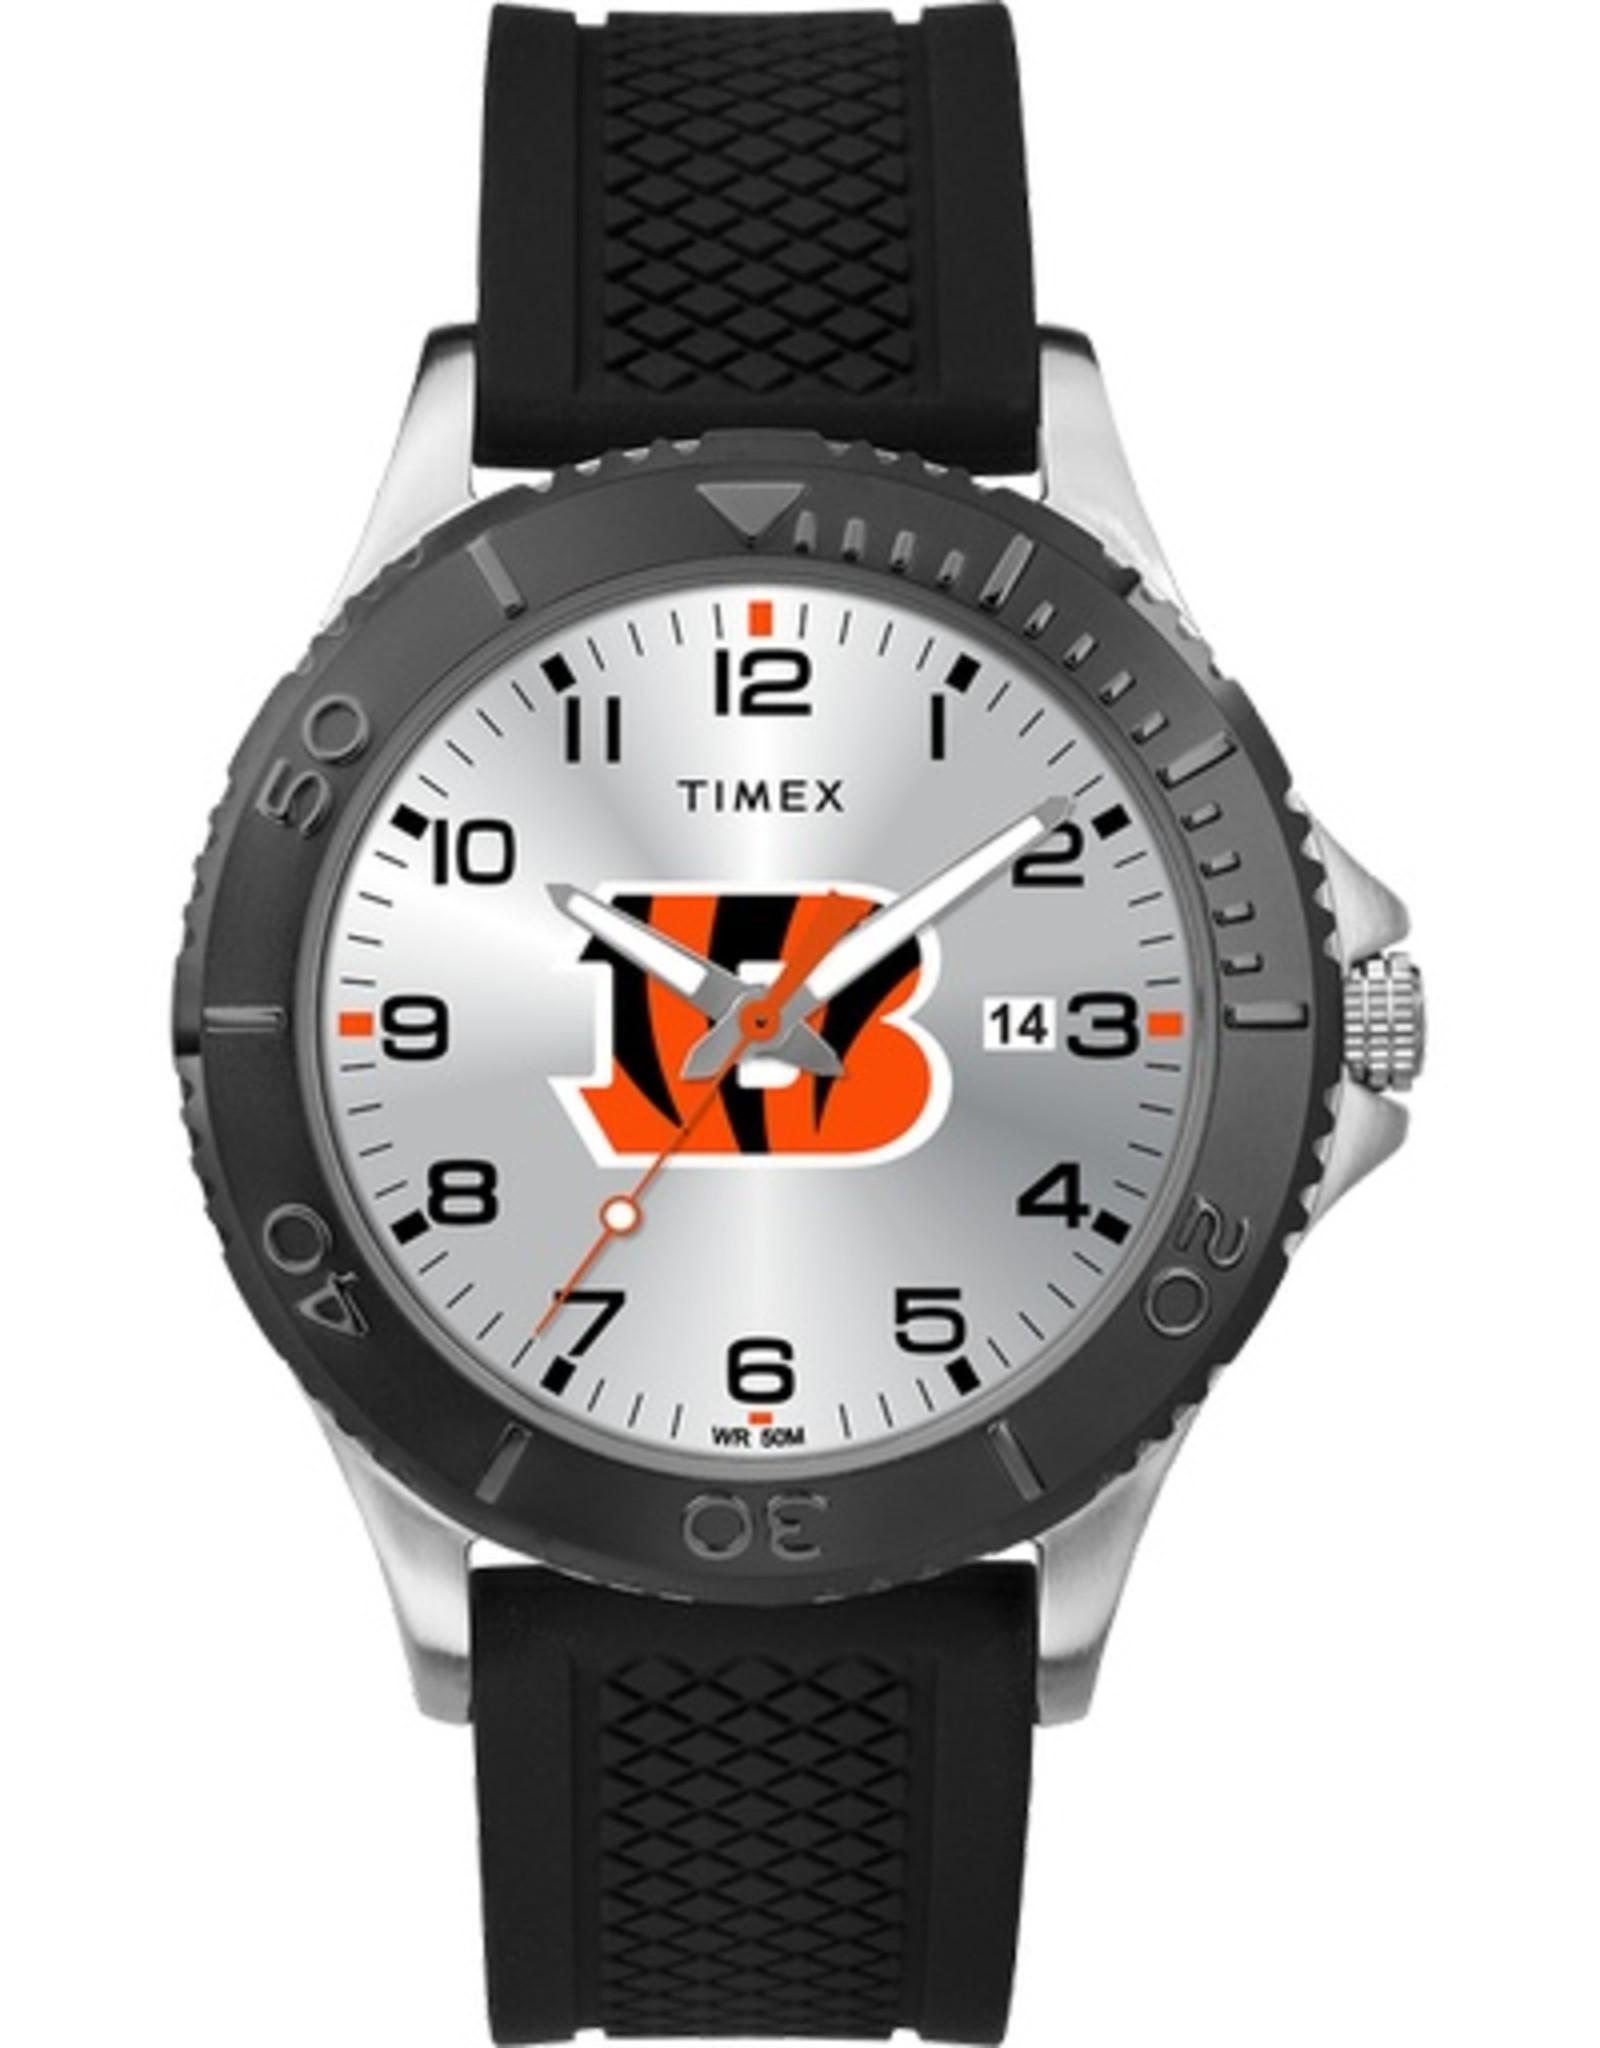 Cincinnati Bengals Timex Gamer Watch